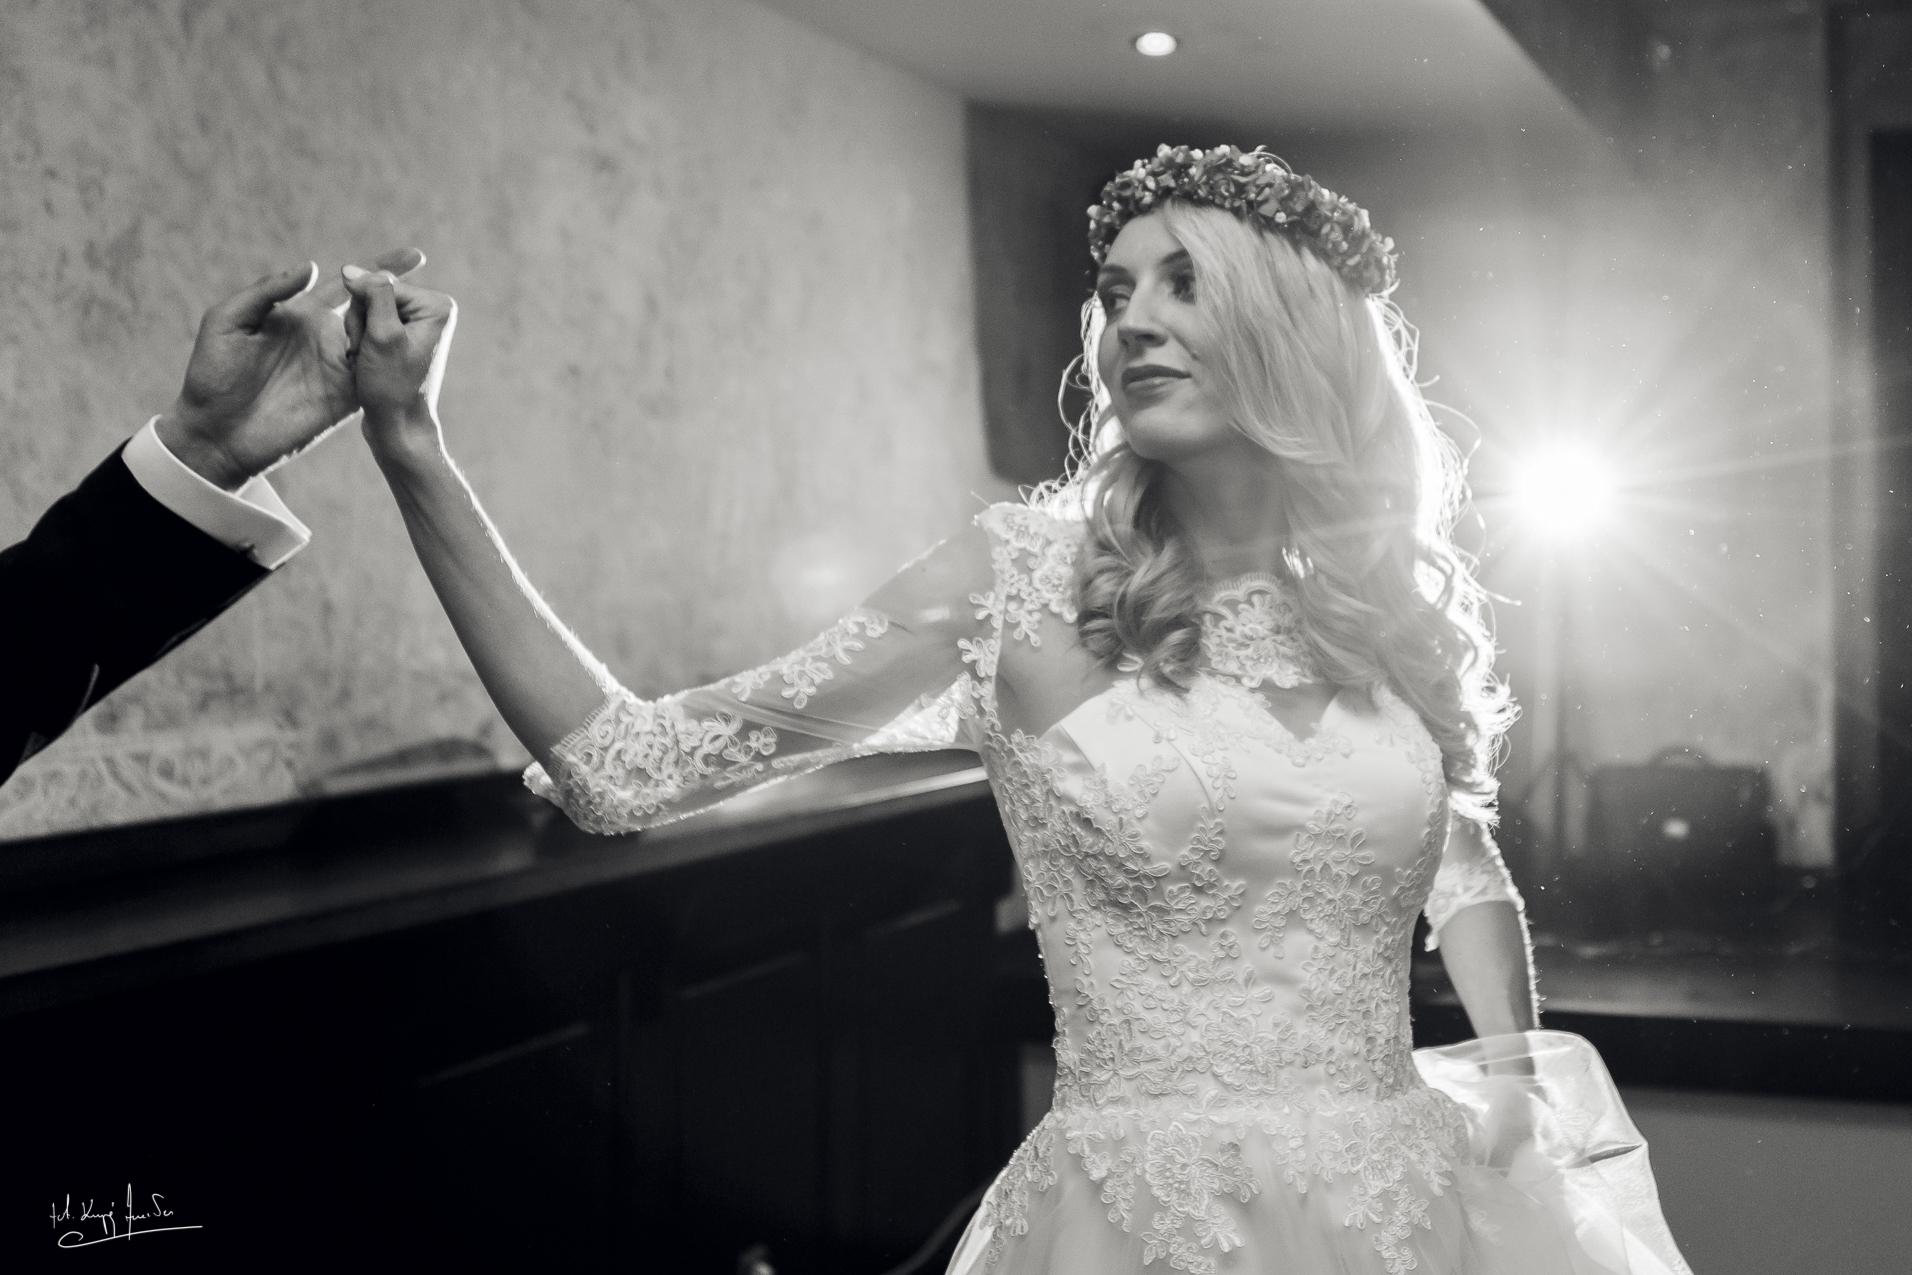 Ślub wesele szklarska poręba 33 Marta & Sławek